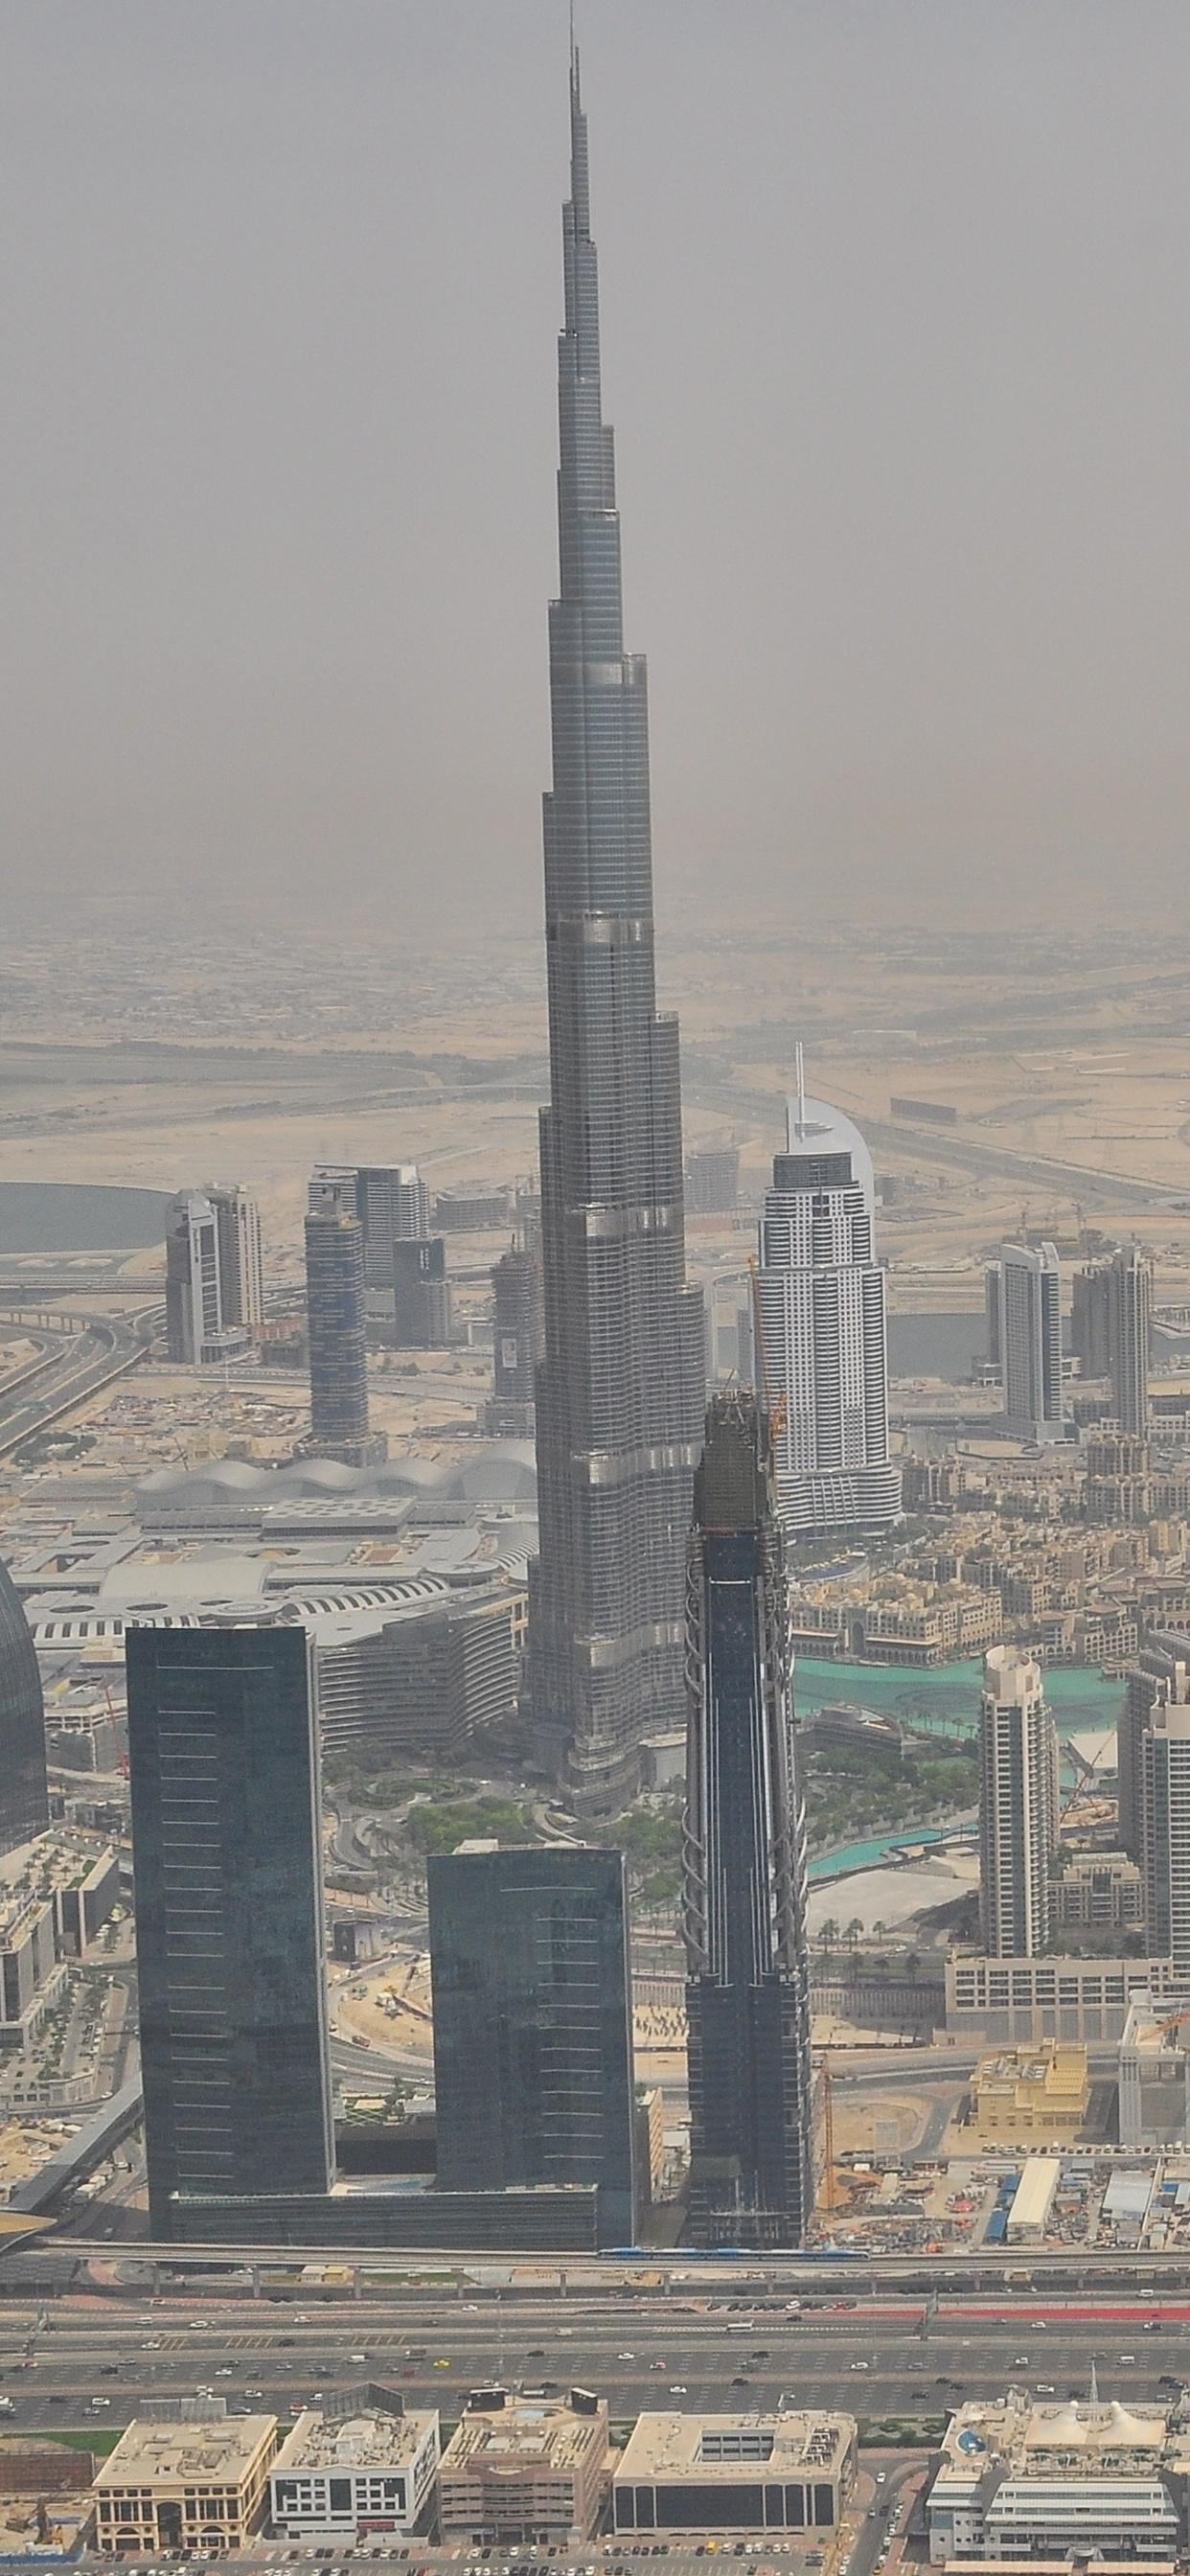 Download Iphone Xs Max Wallpaper Dubai Cikimm Com